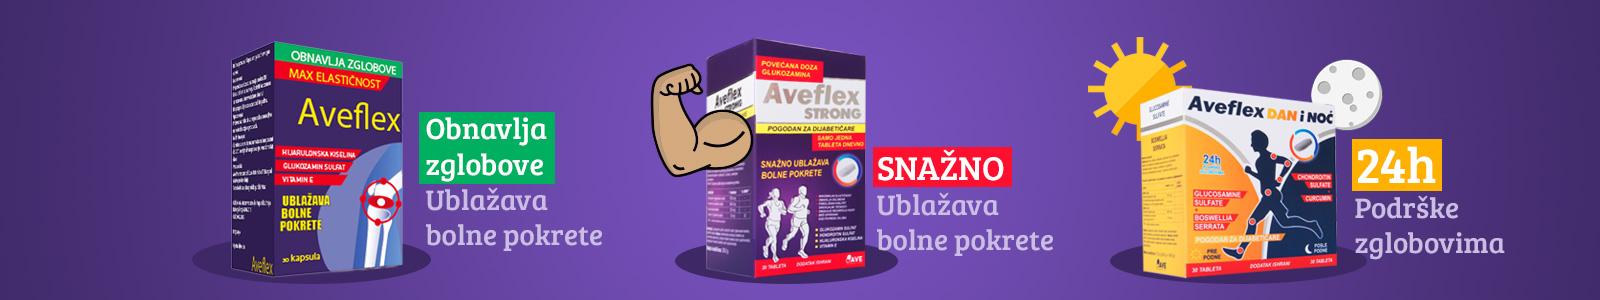 aveflex